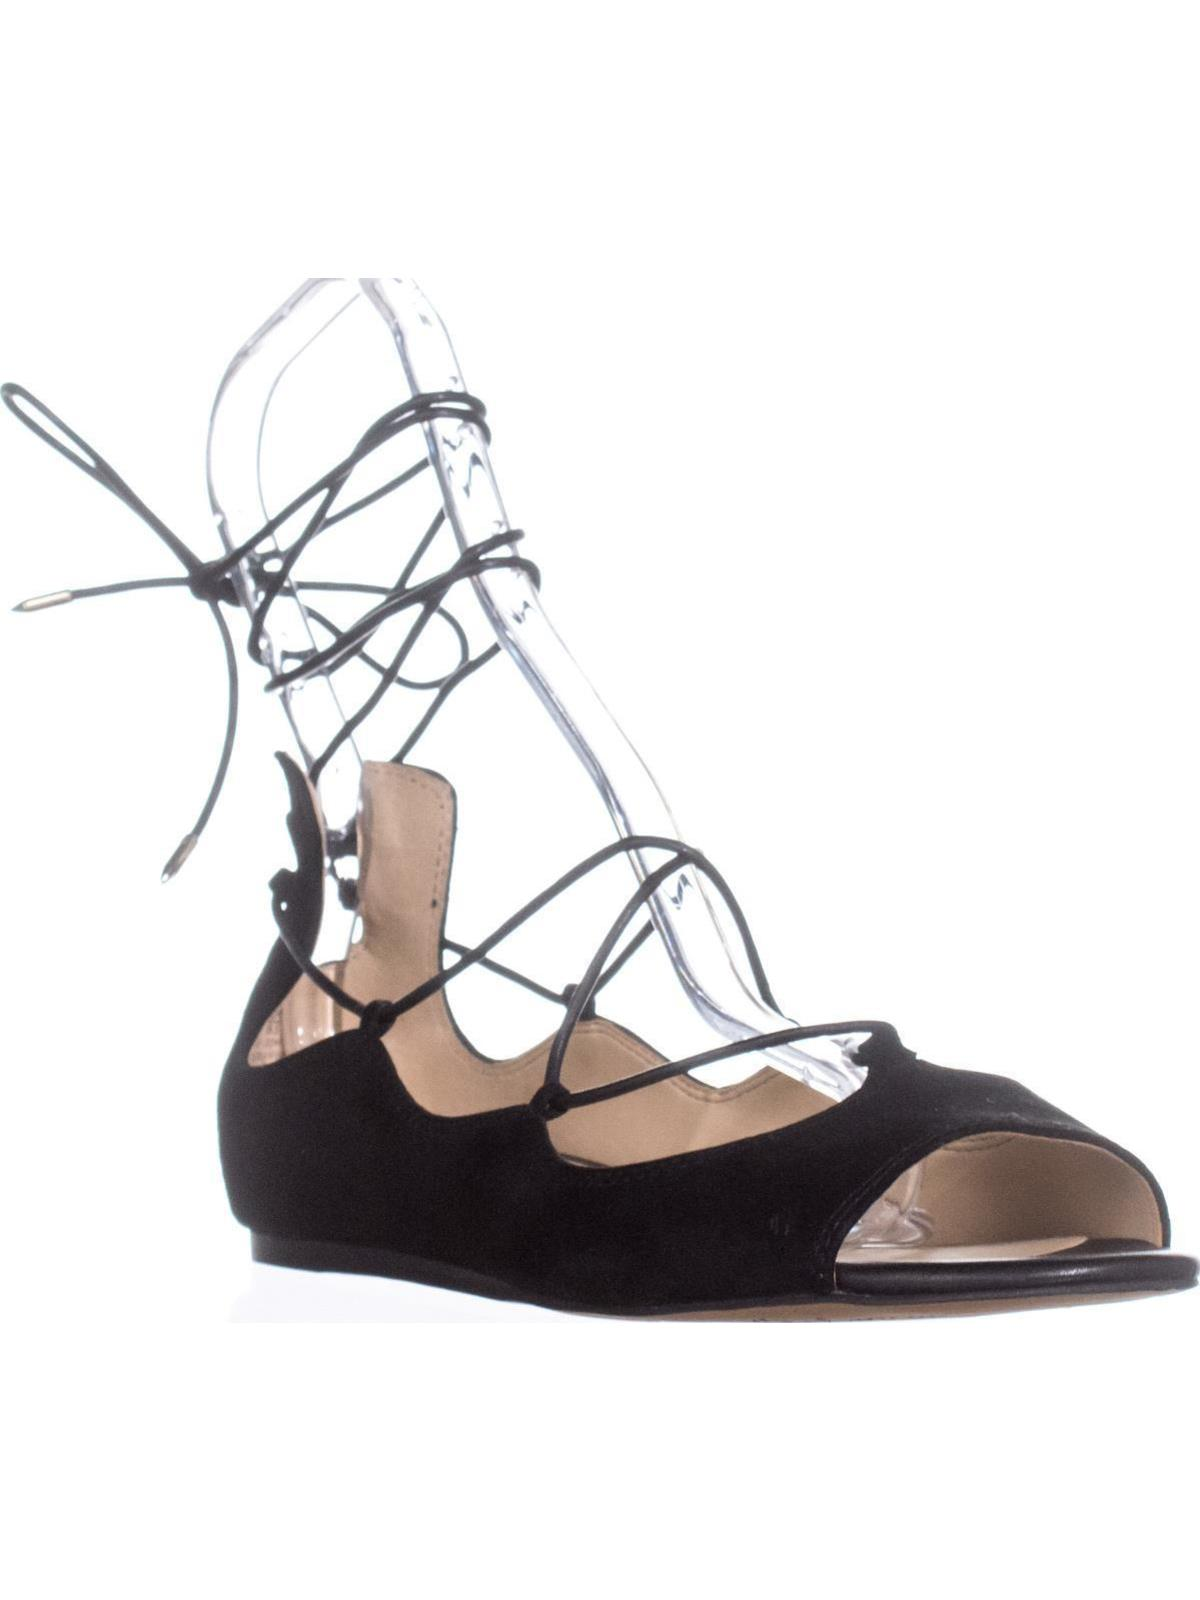 451bd9b6a534 Sam Edelman Barbara Lace Up Ballet Flats